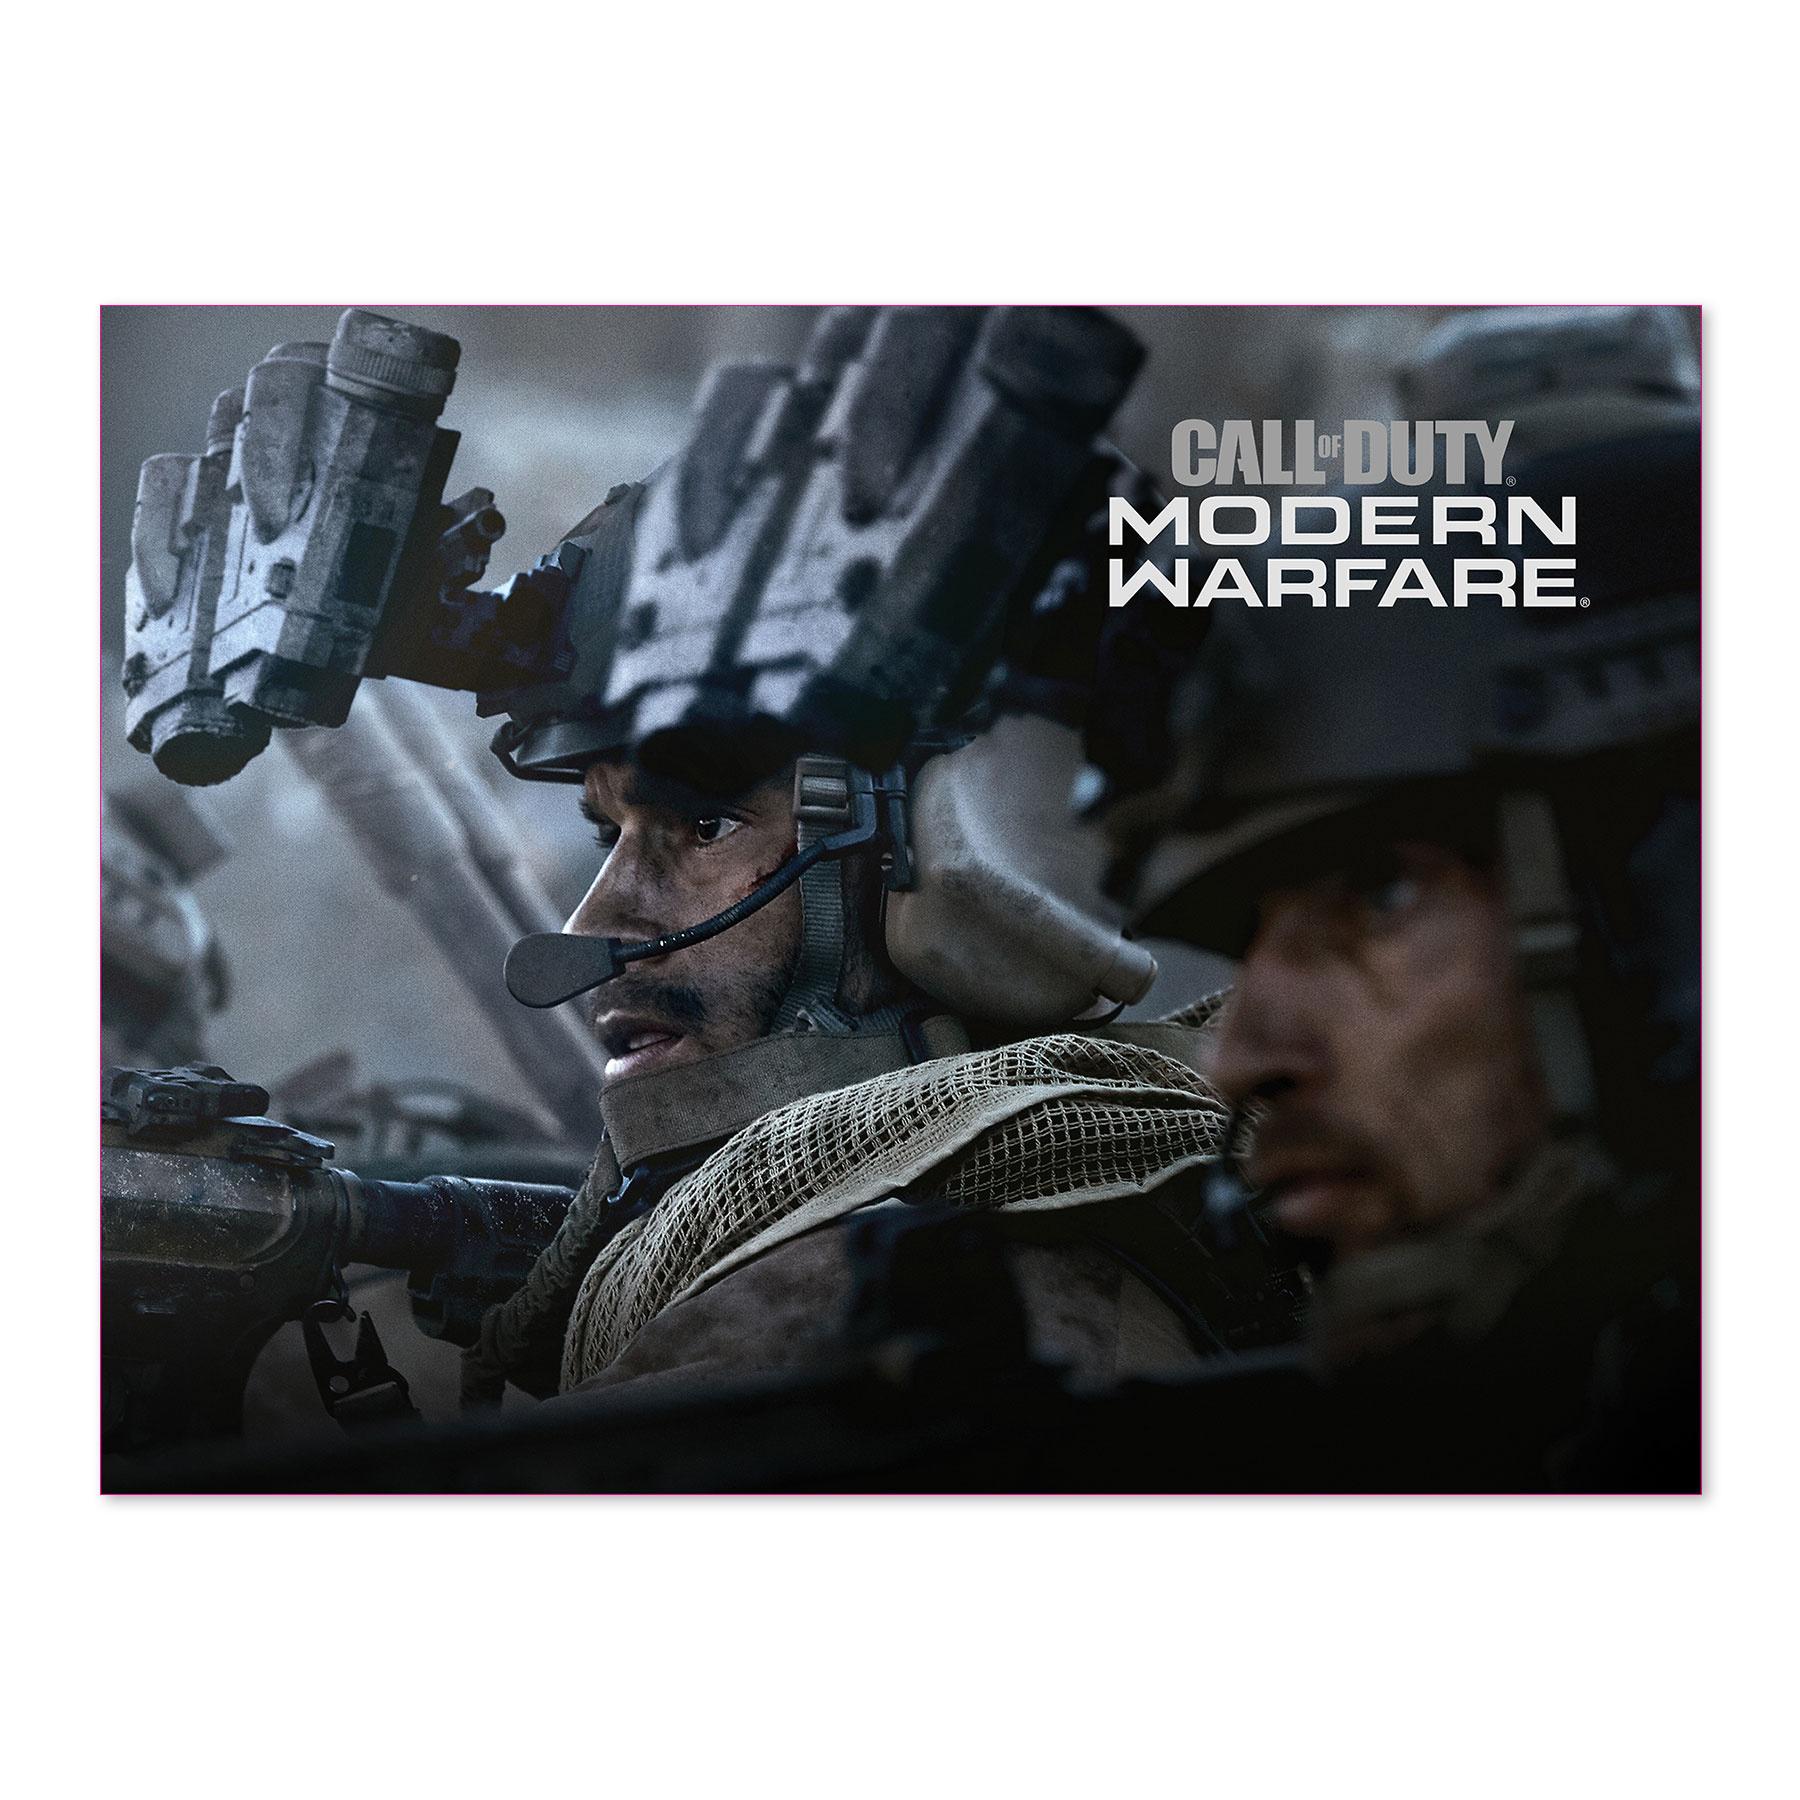 Call Of Duty Modern Warfare Launch Wall Poster